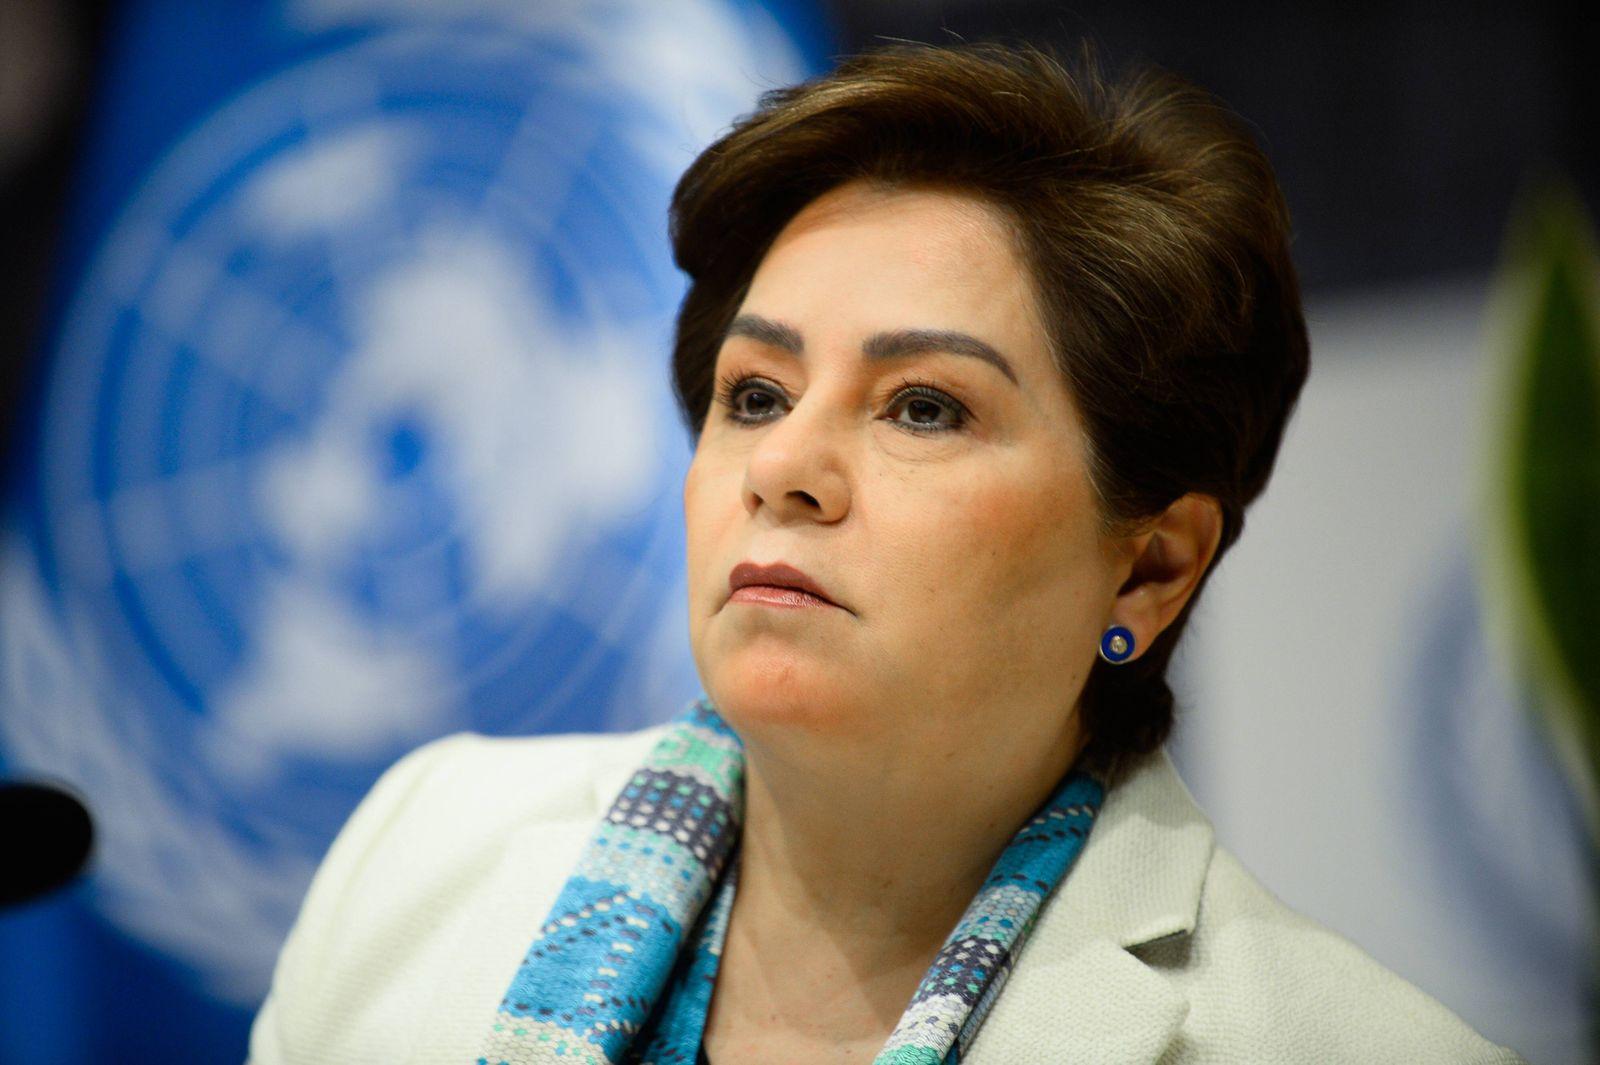 December 4 2018 Katowice Poland Patricia Espinosa executive secretary of the United Nations F